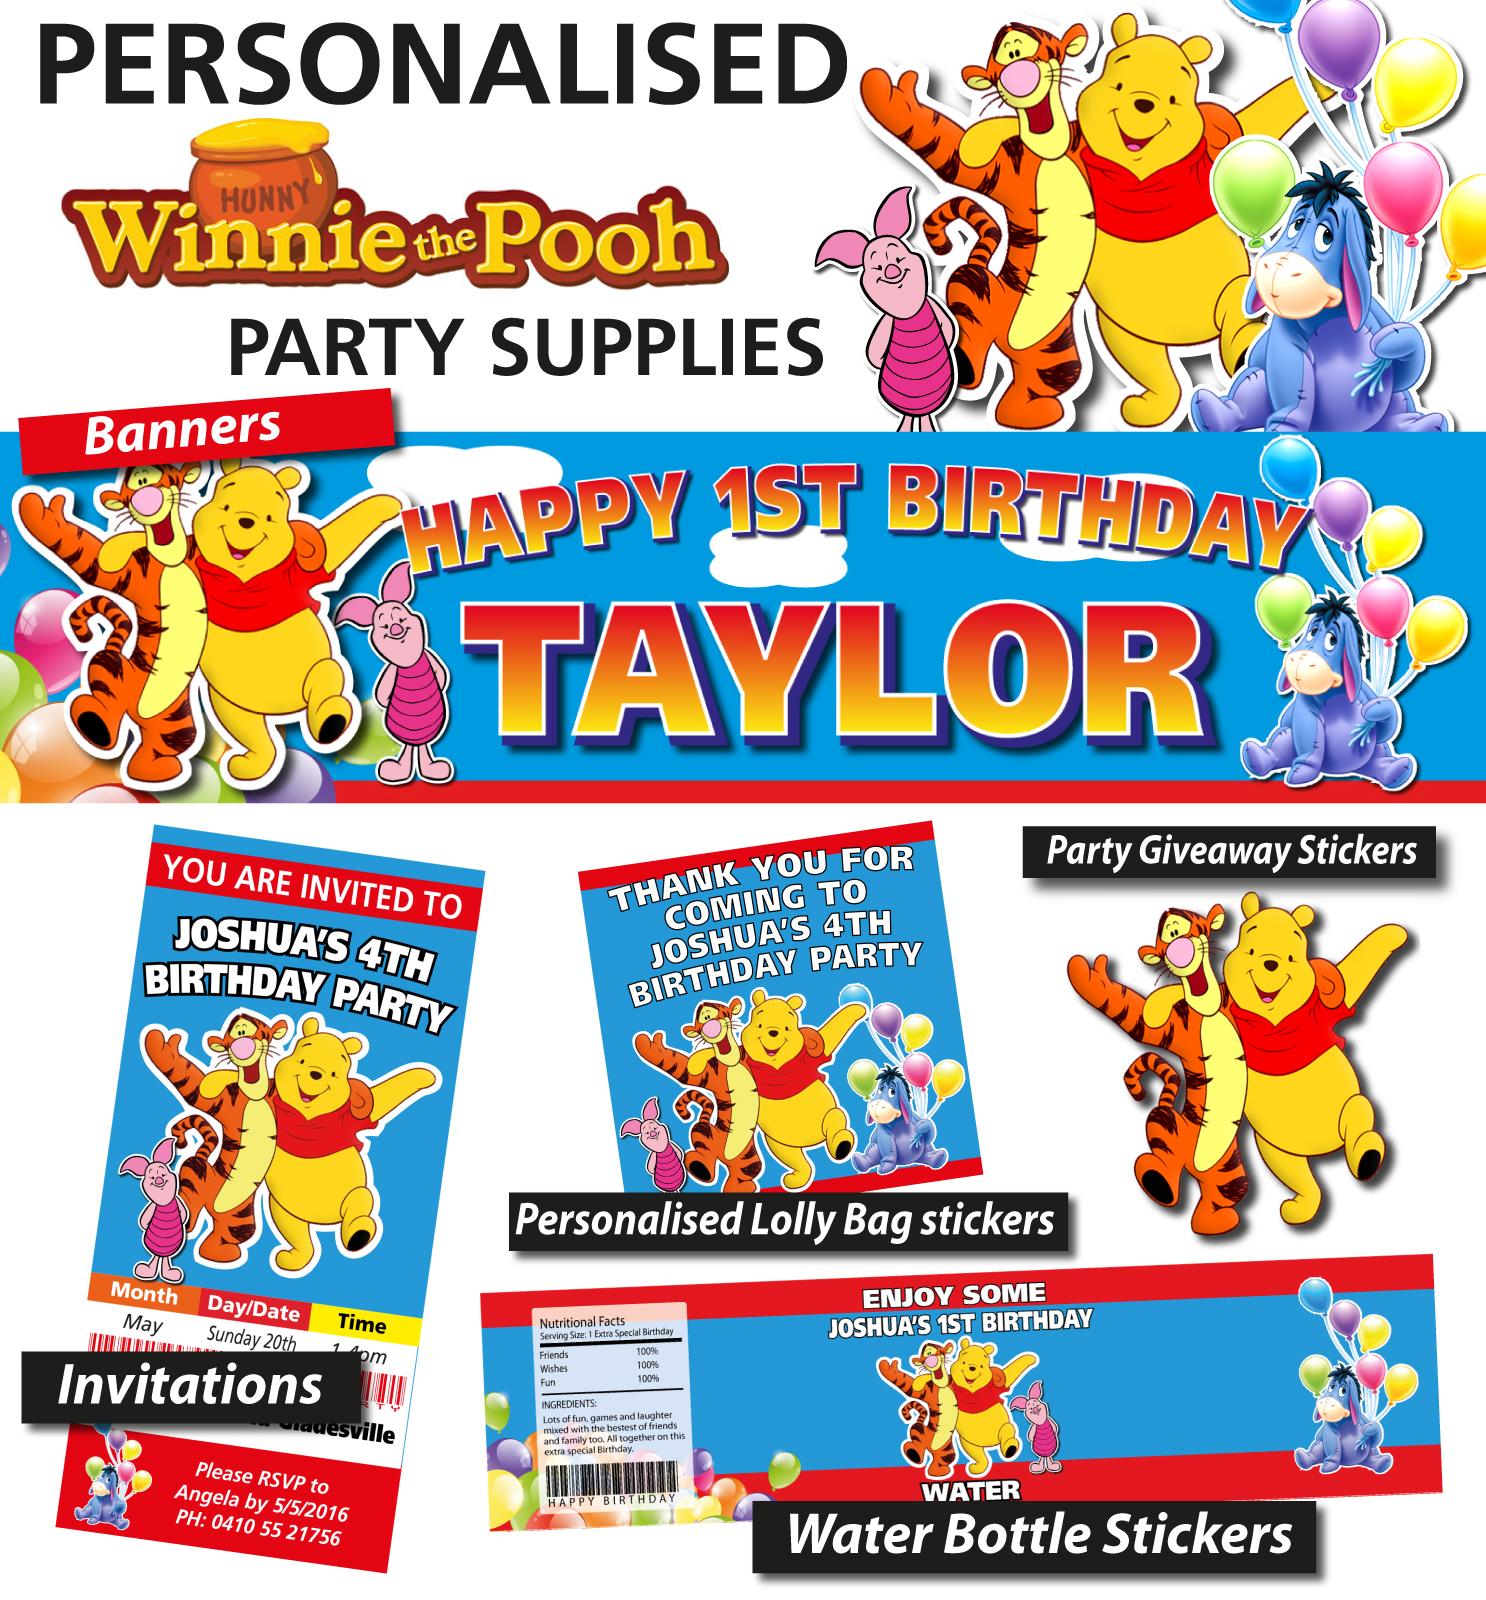 winnie-the-pooh-party-supplies-ebay.jpg